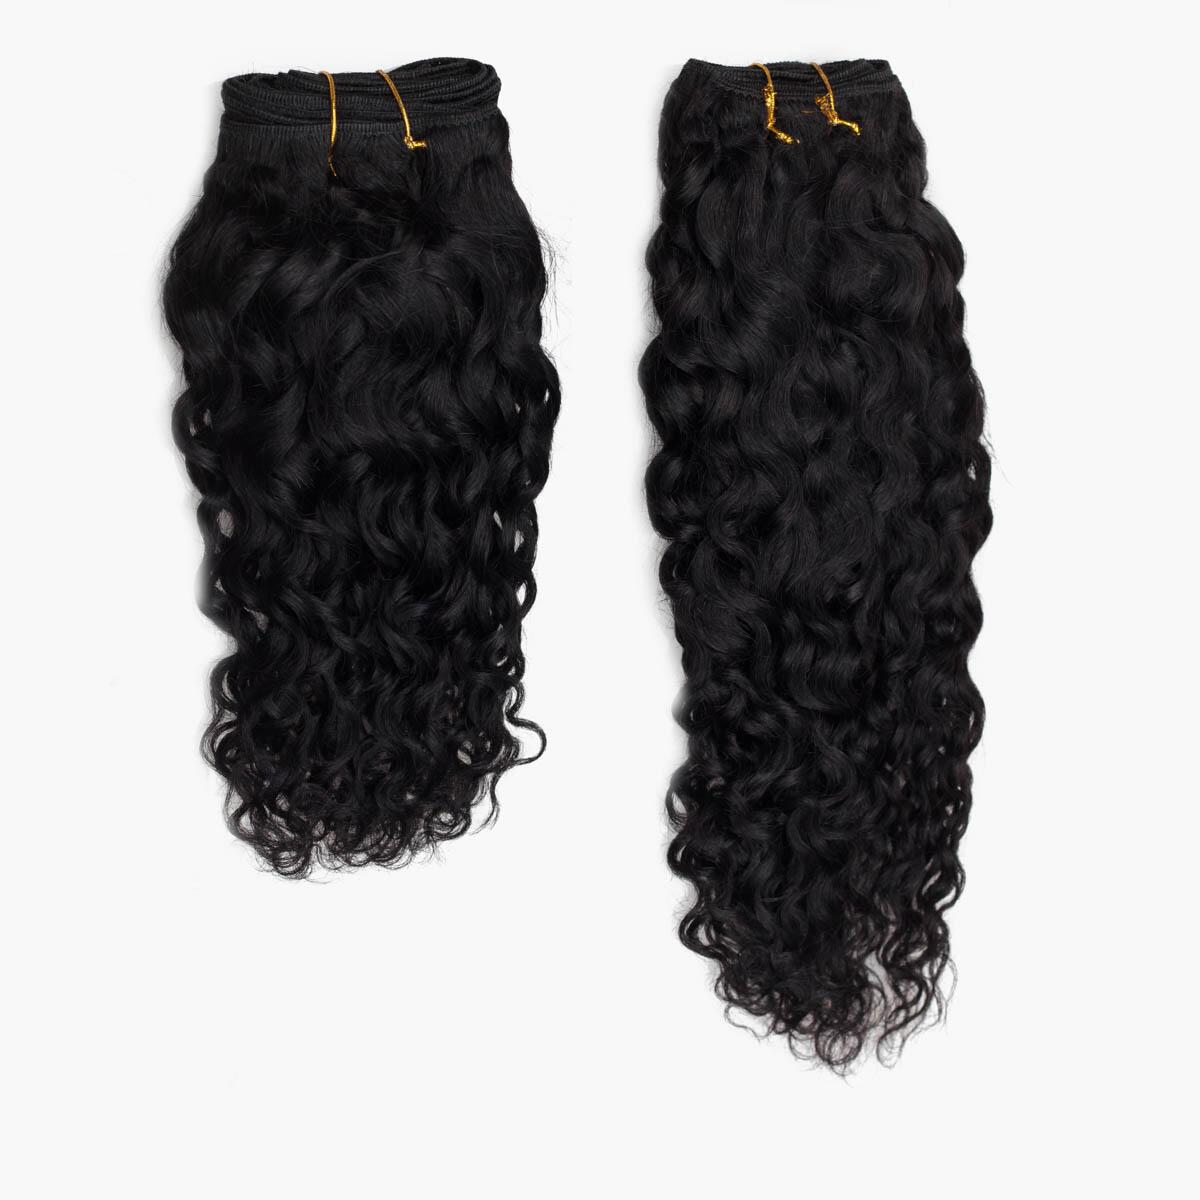 Hair Weft 1.0 Black 40 cm